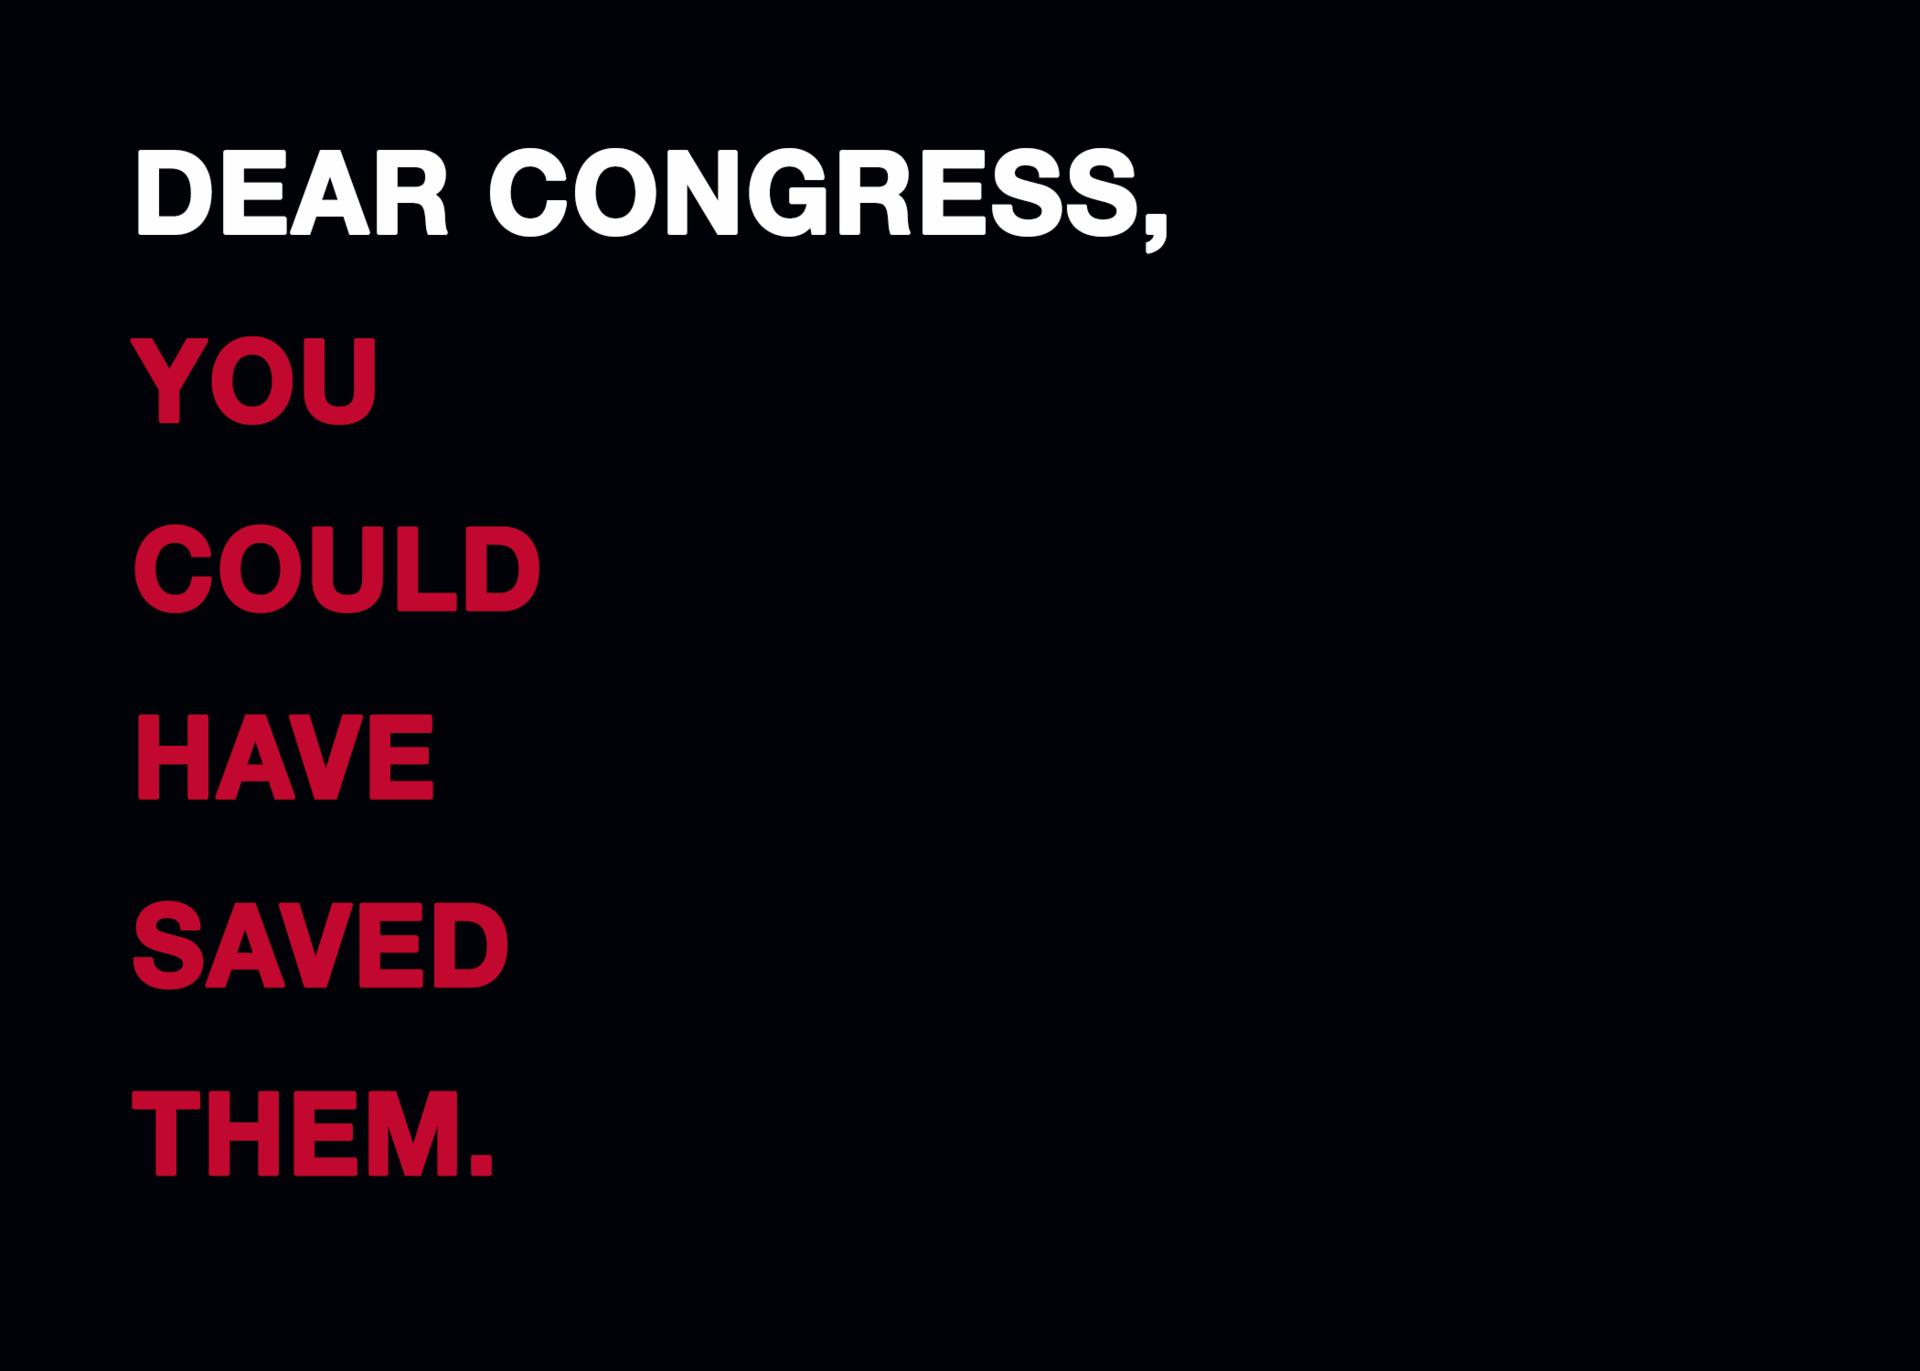 DEAR CONGRESS - The Fight for Gun Control Store